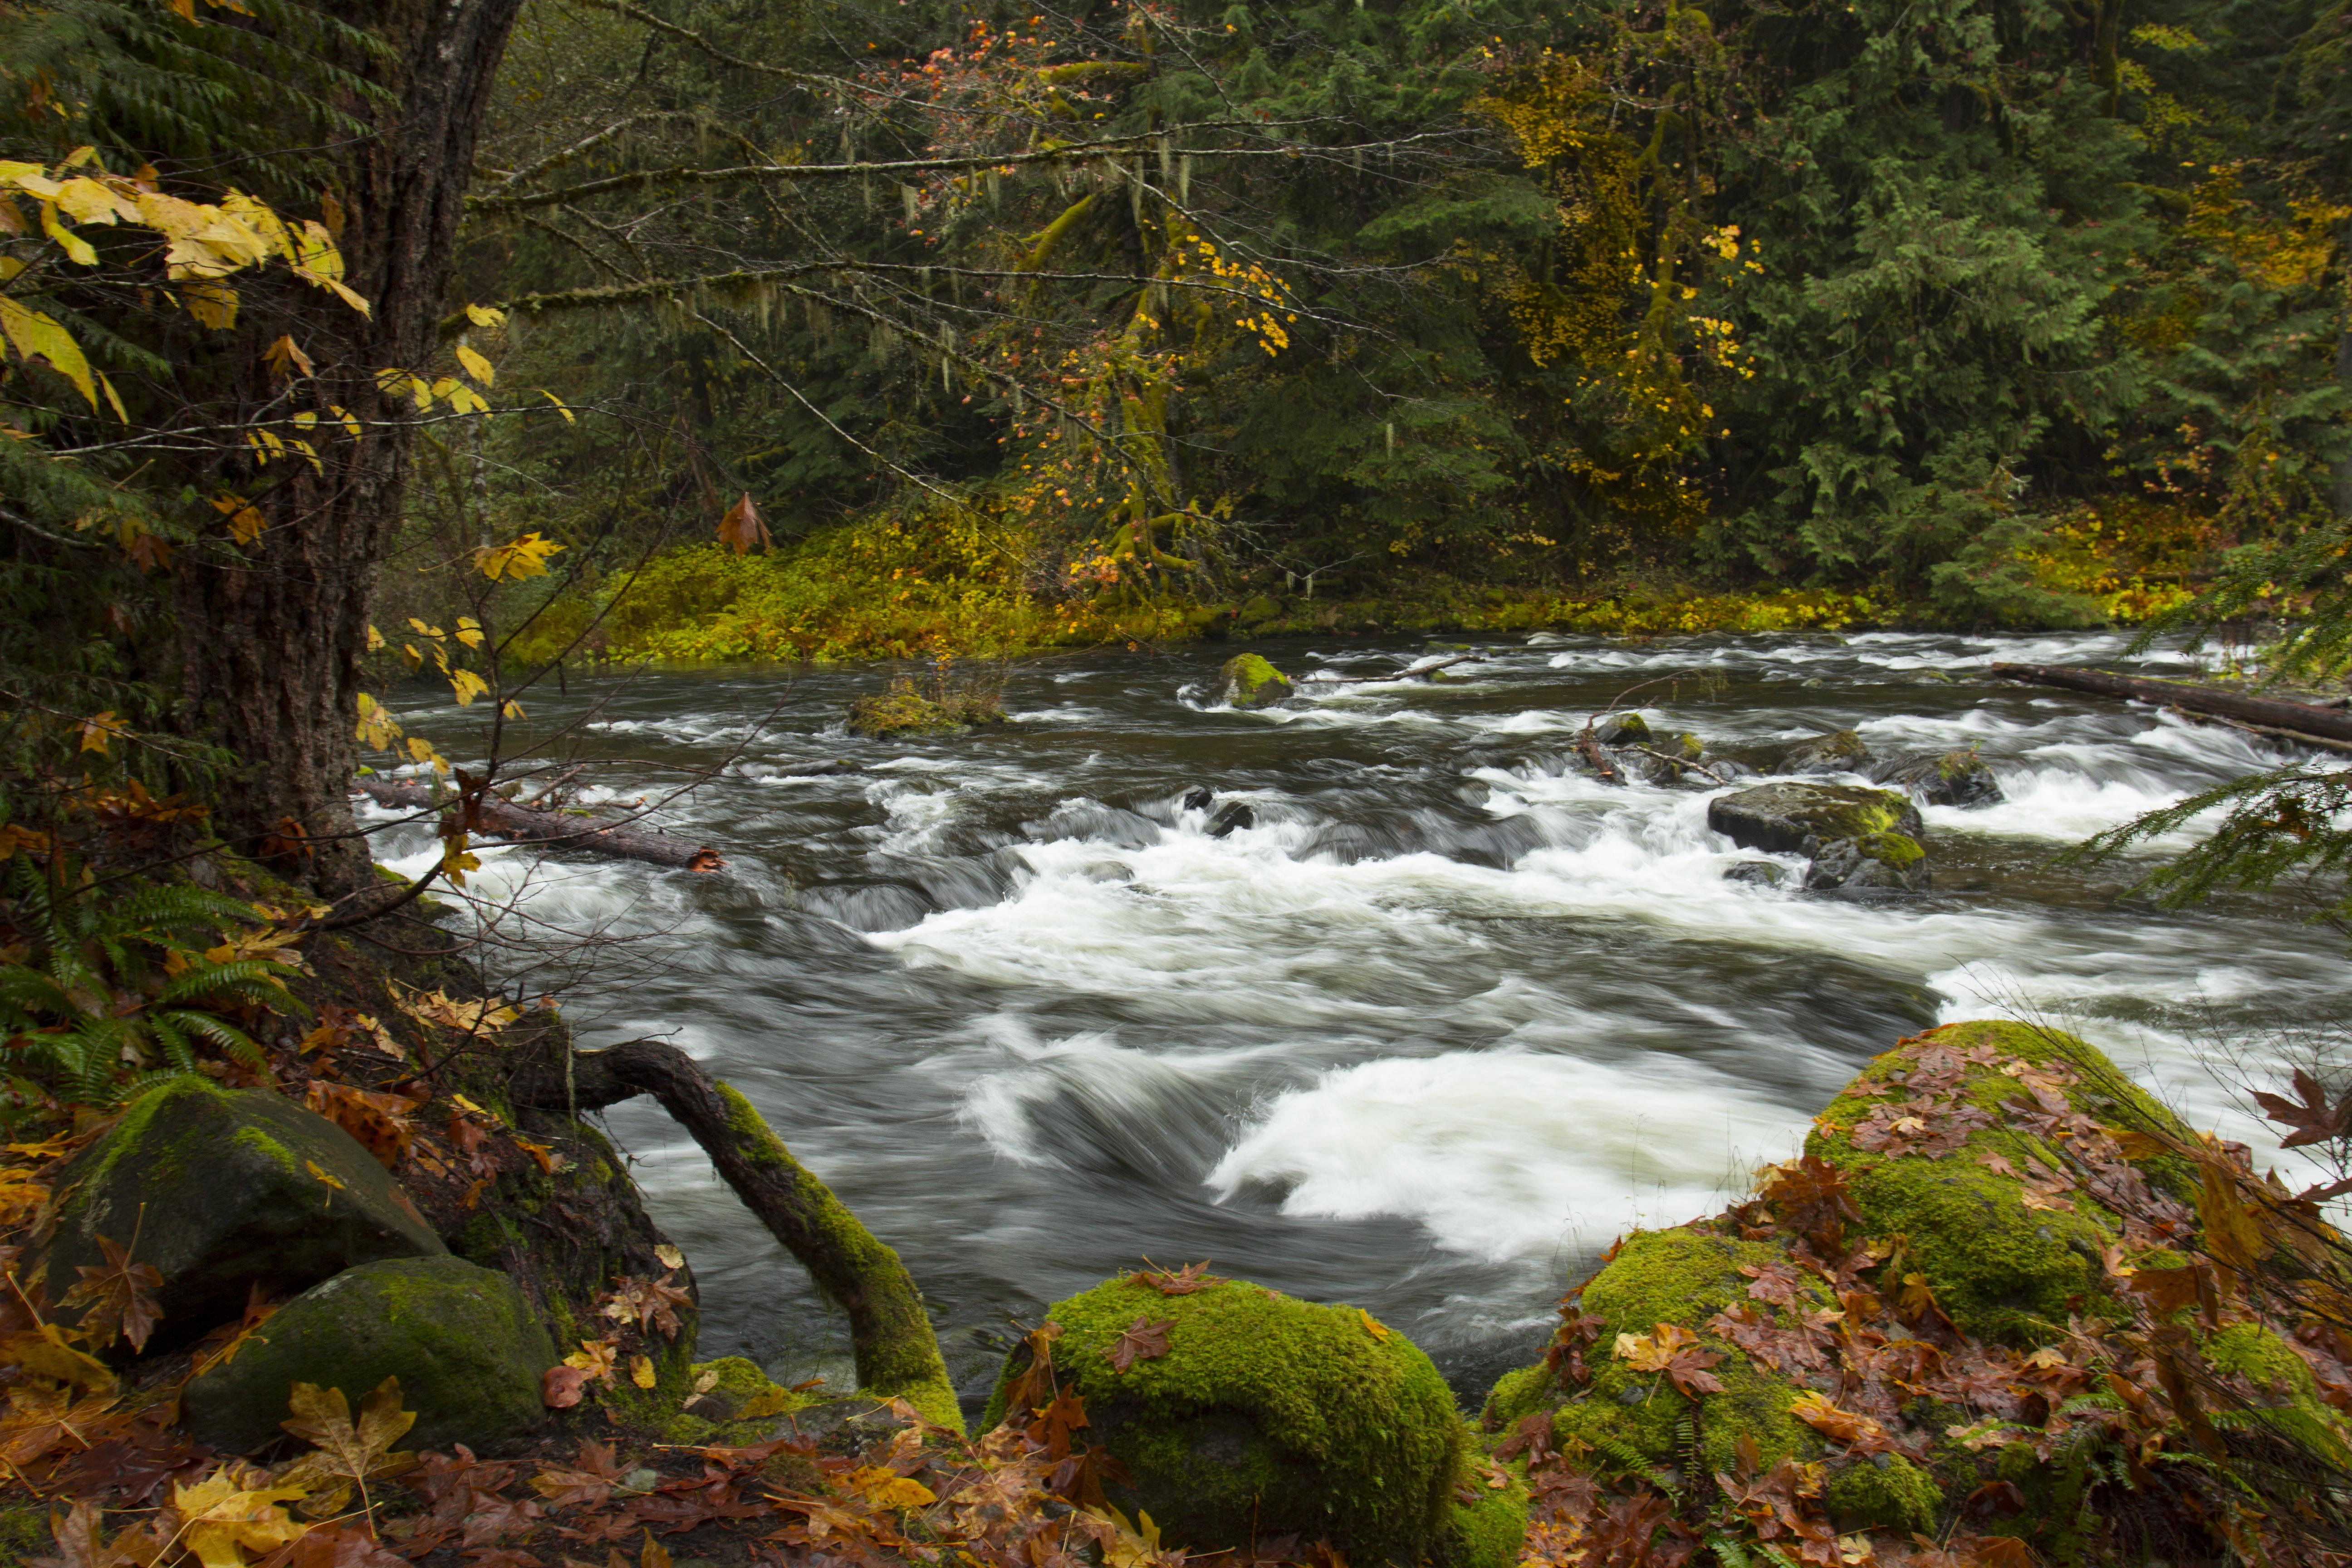 Clackamas River, Oregon, Autumn, Creek, Fall, Forest, HQ Photo